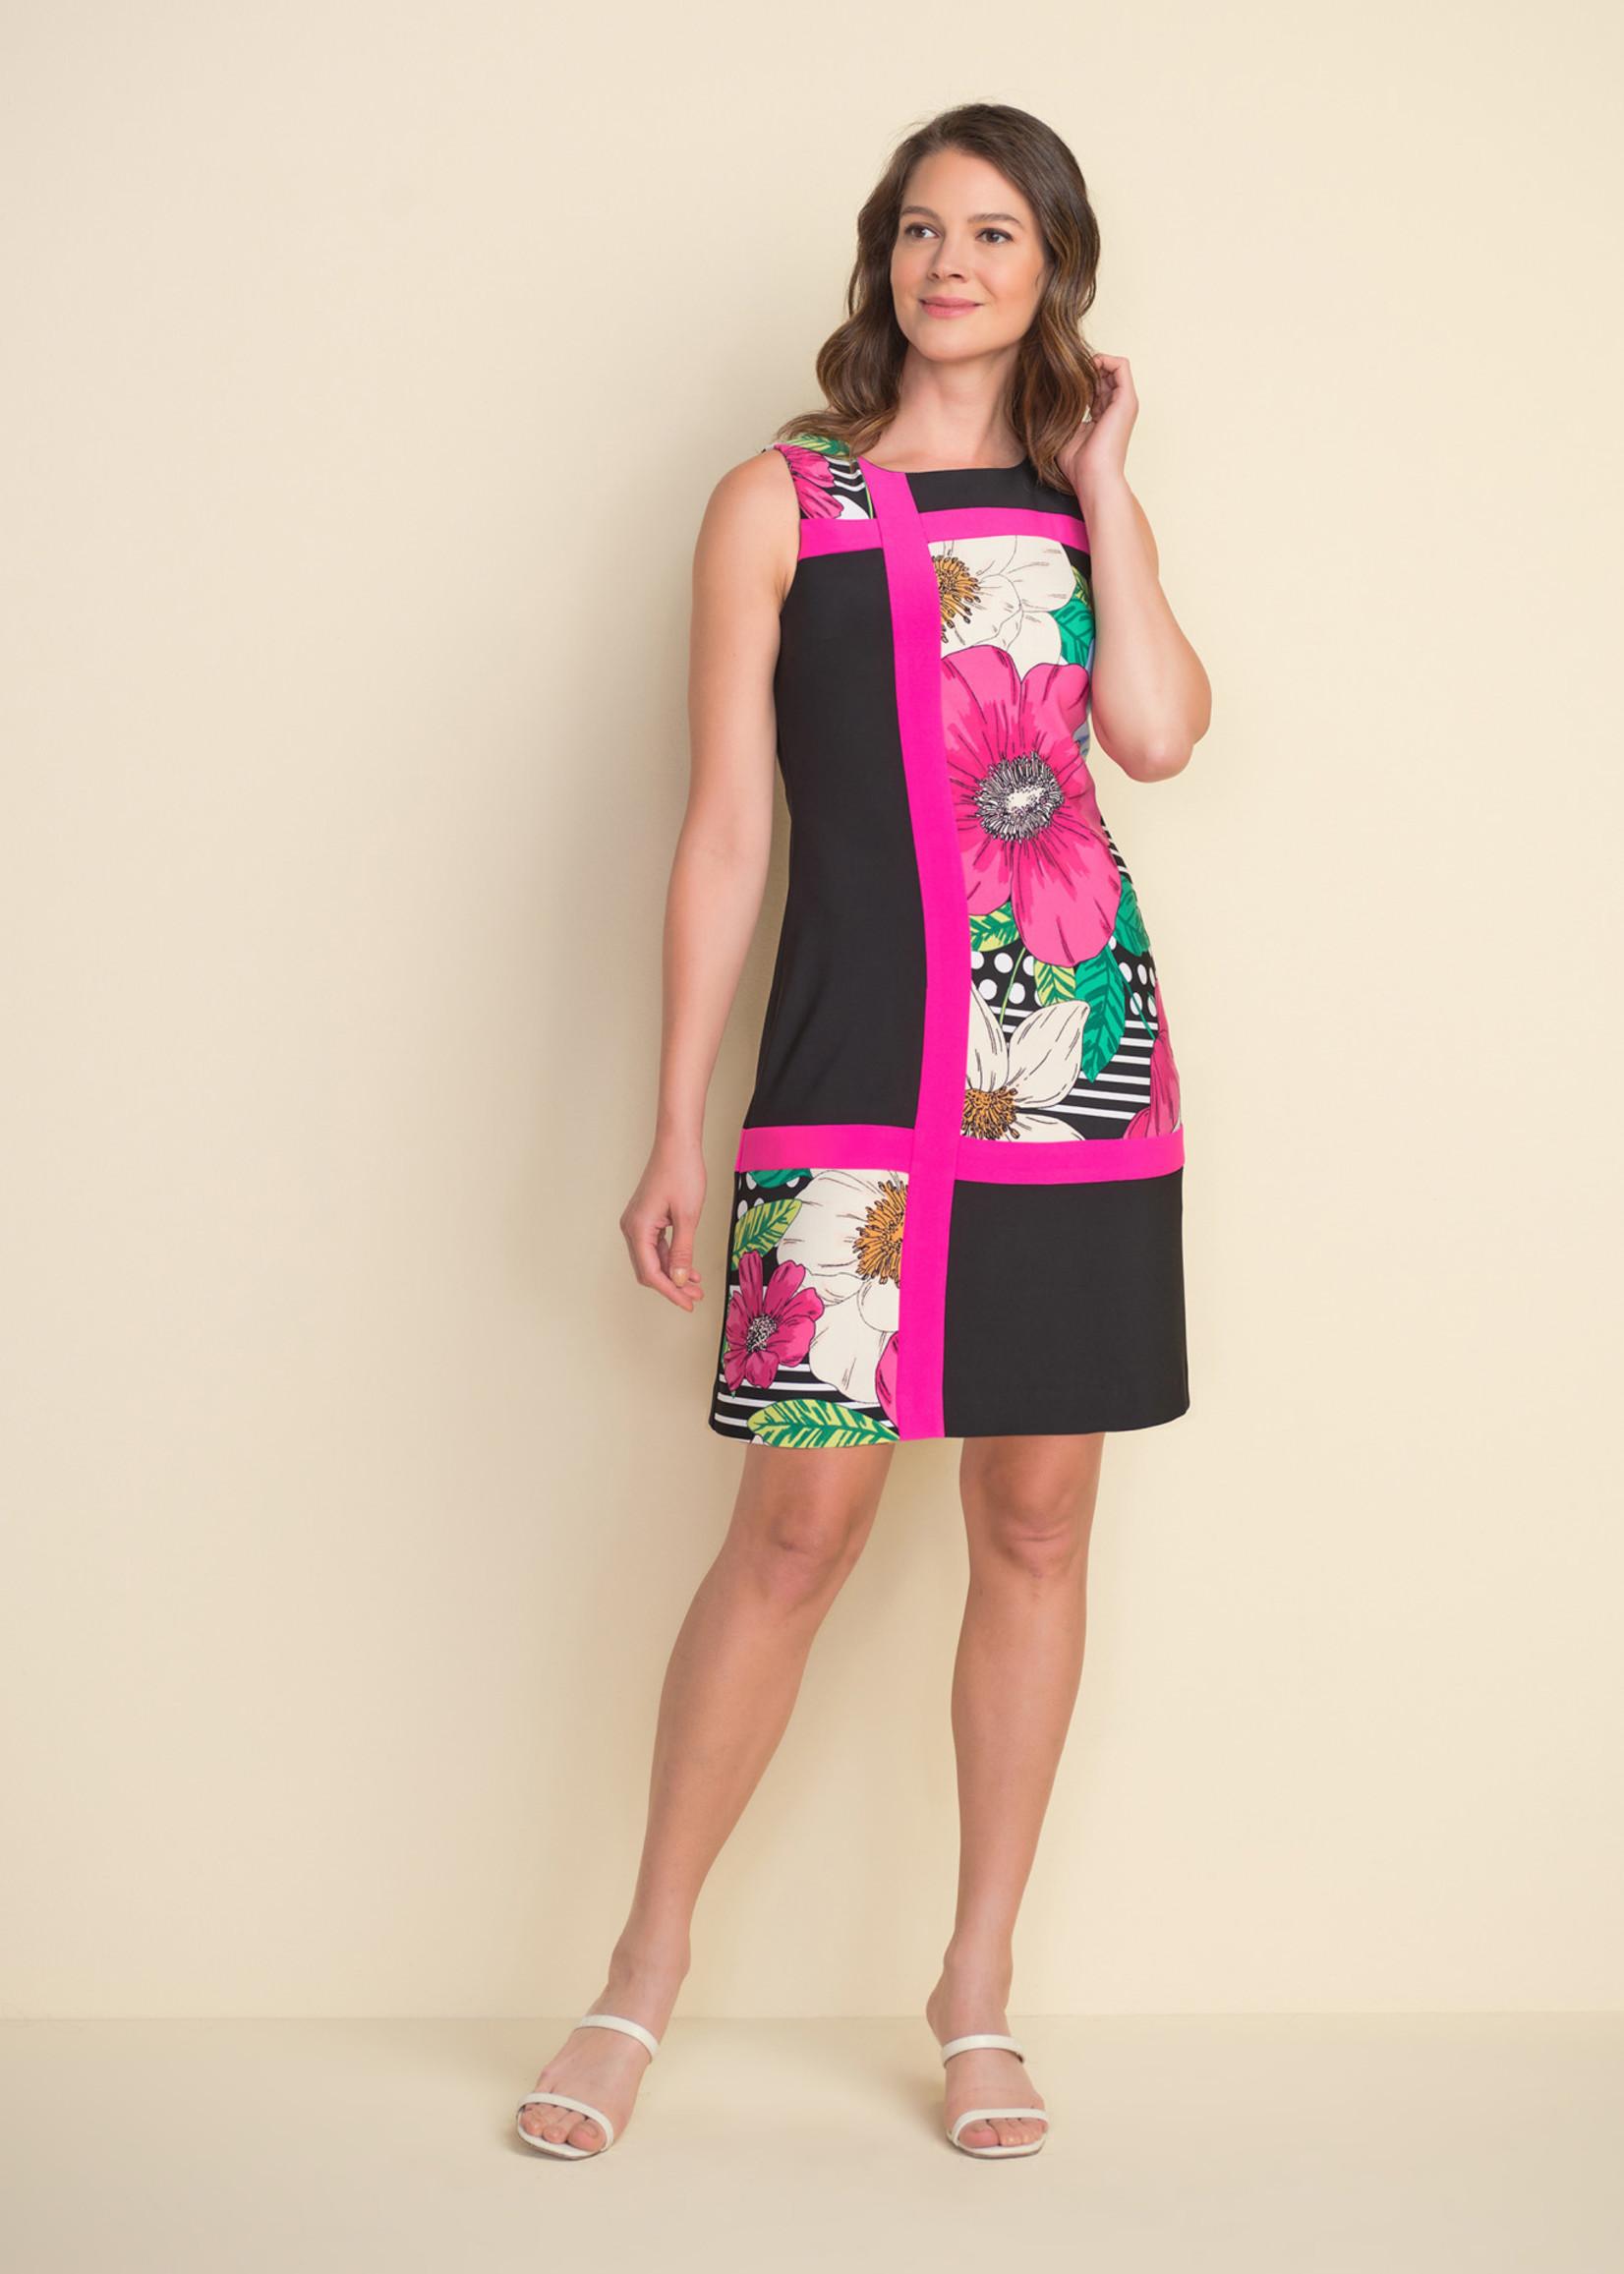 Joseph Ribkoff Joseph Ribkoff Floral Colour Block Dress Style